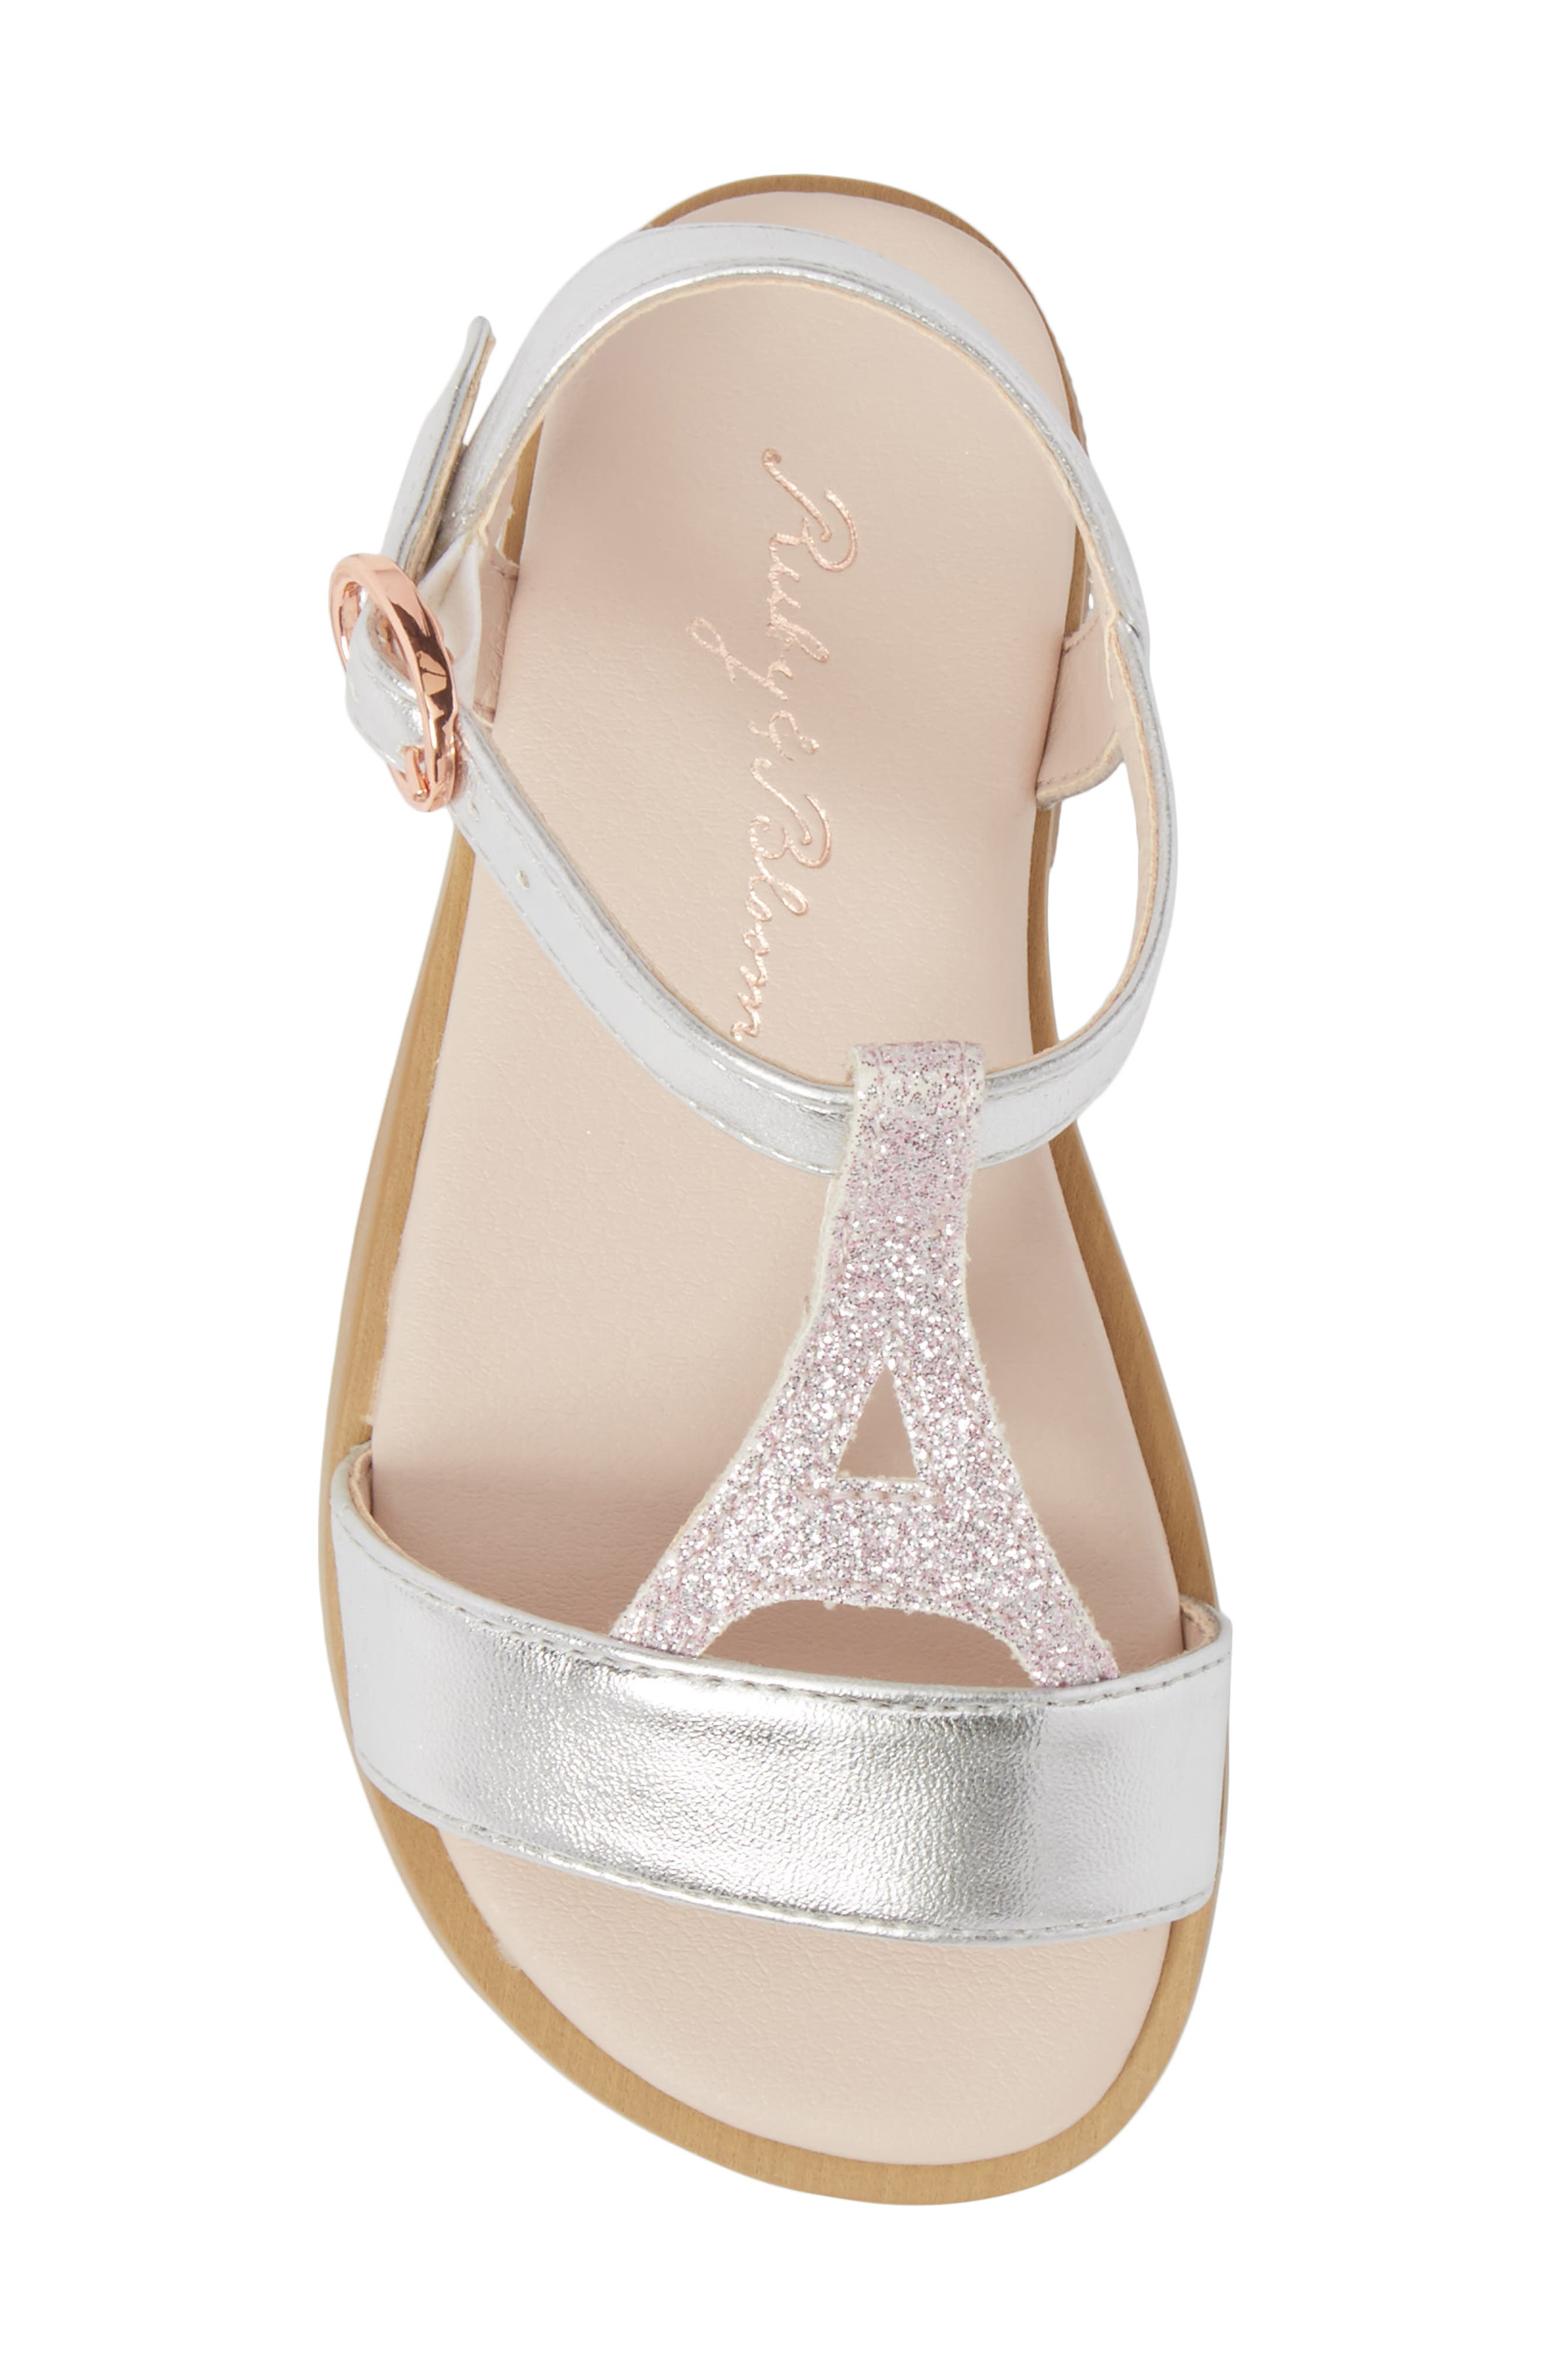 Tegan Glitter T-Strap Sandal,                             Alternate thumbnail 5, color,                             040